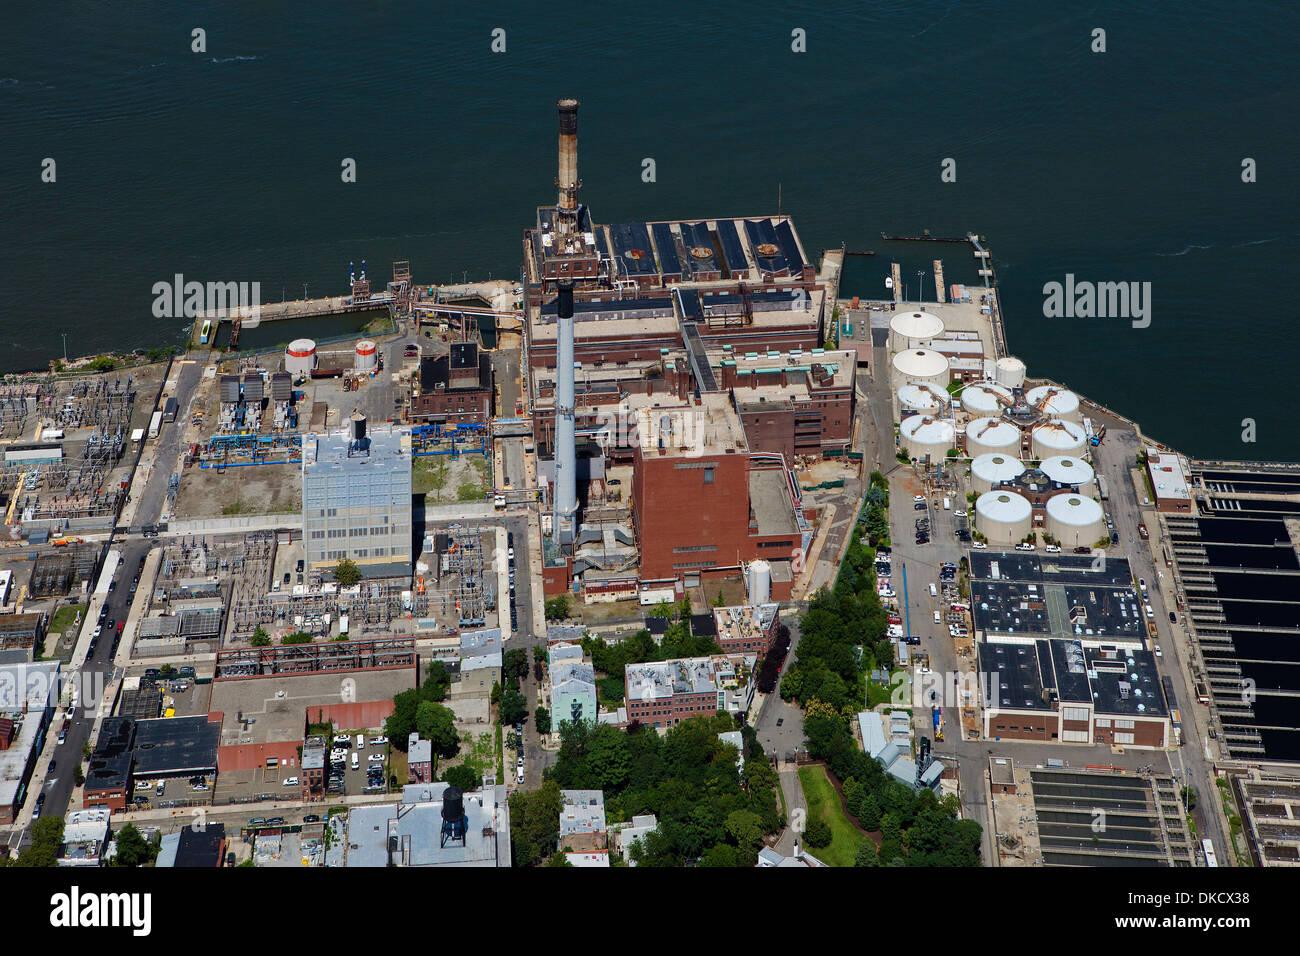 aerial photograph Brooklyn Navy Yard Cogeneration Facility, Brooklyn, New York Stock Photo